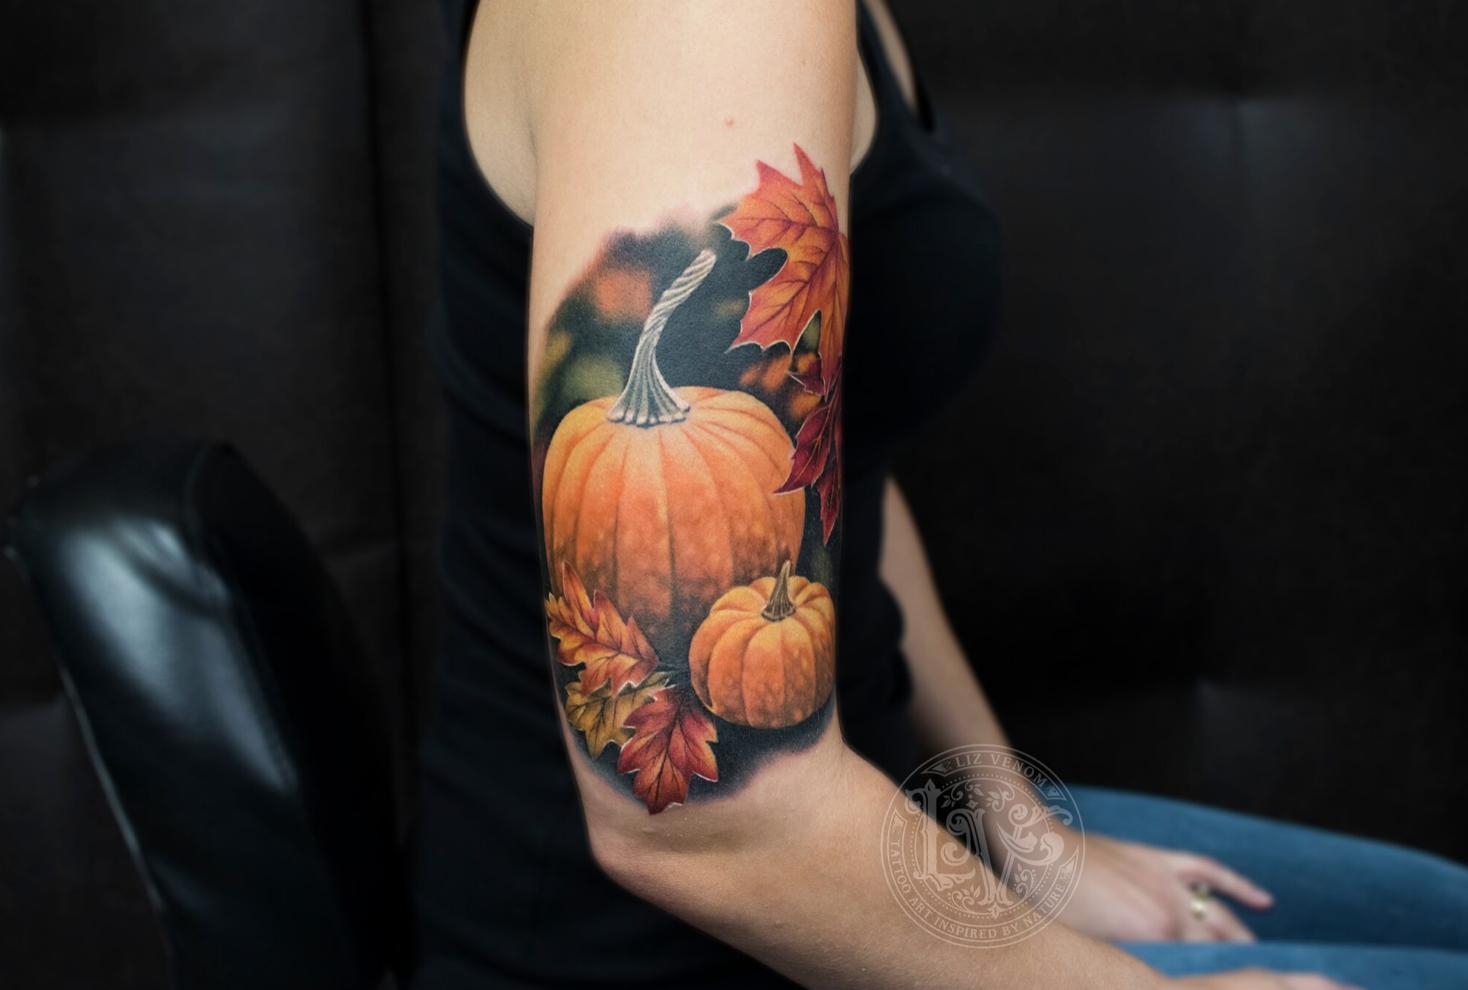 fall themed tattoo, pumpkin spice tattoos anyone